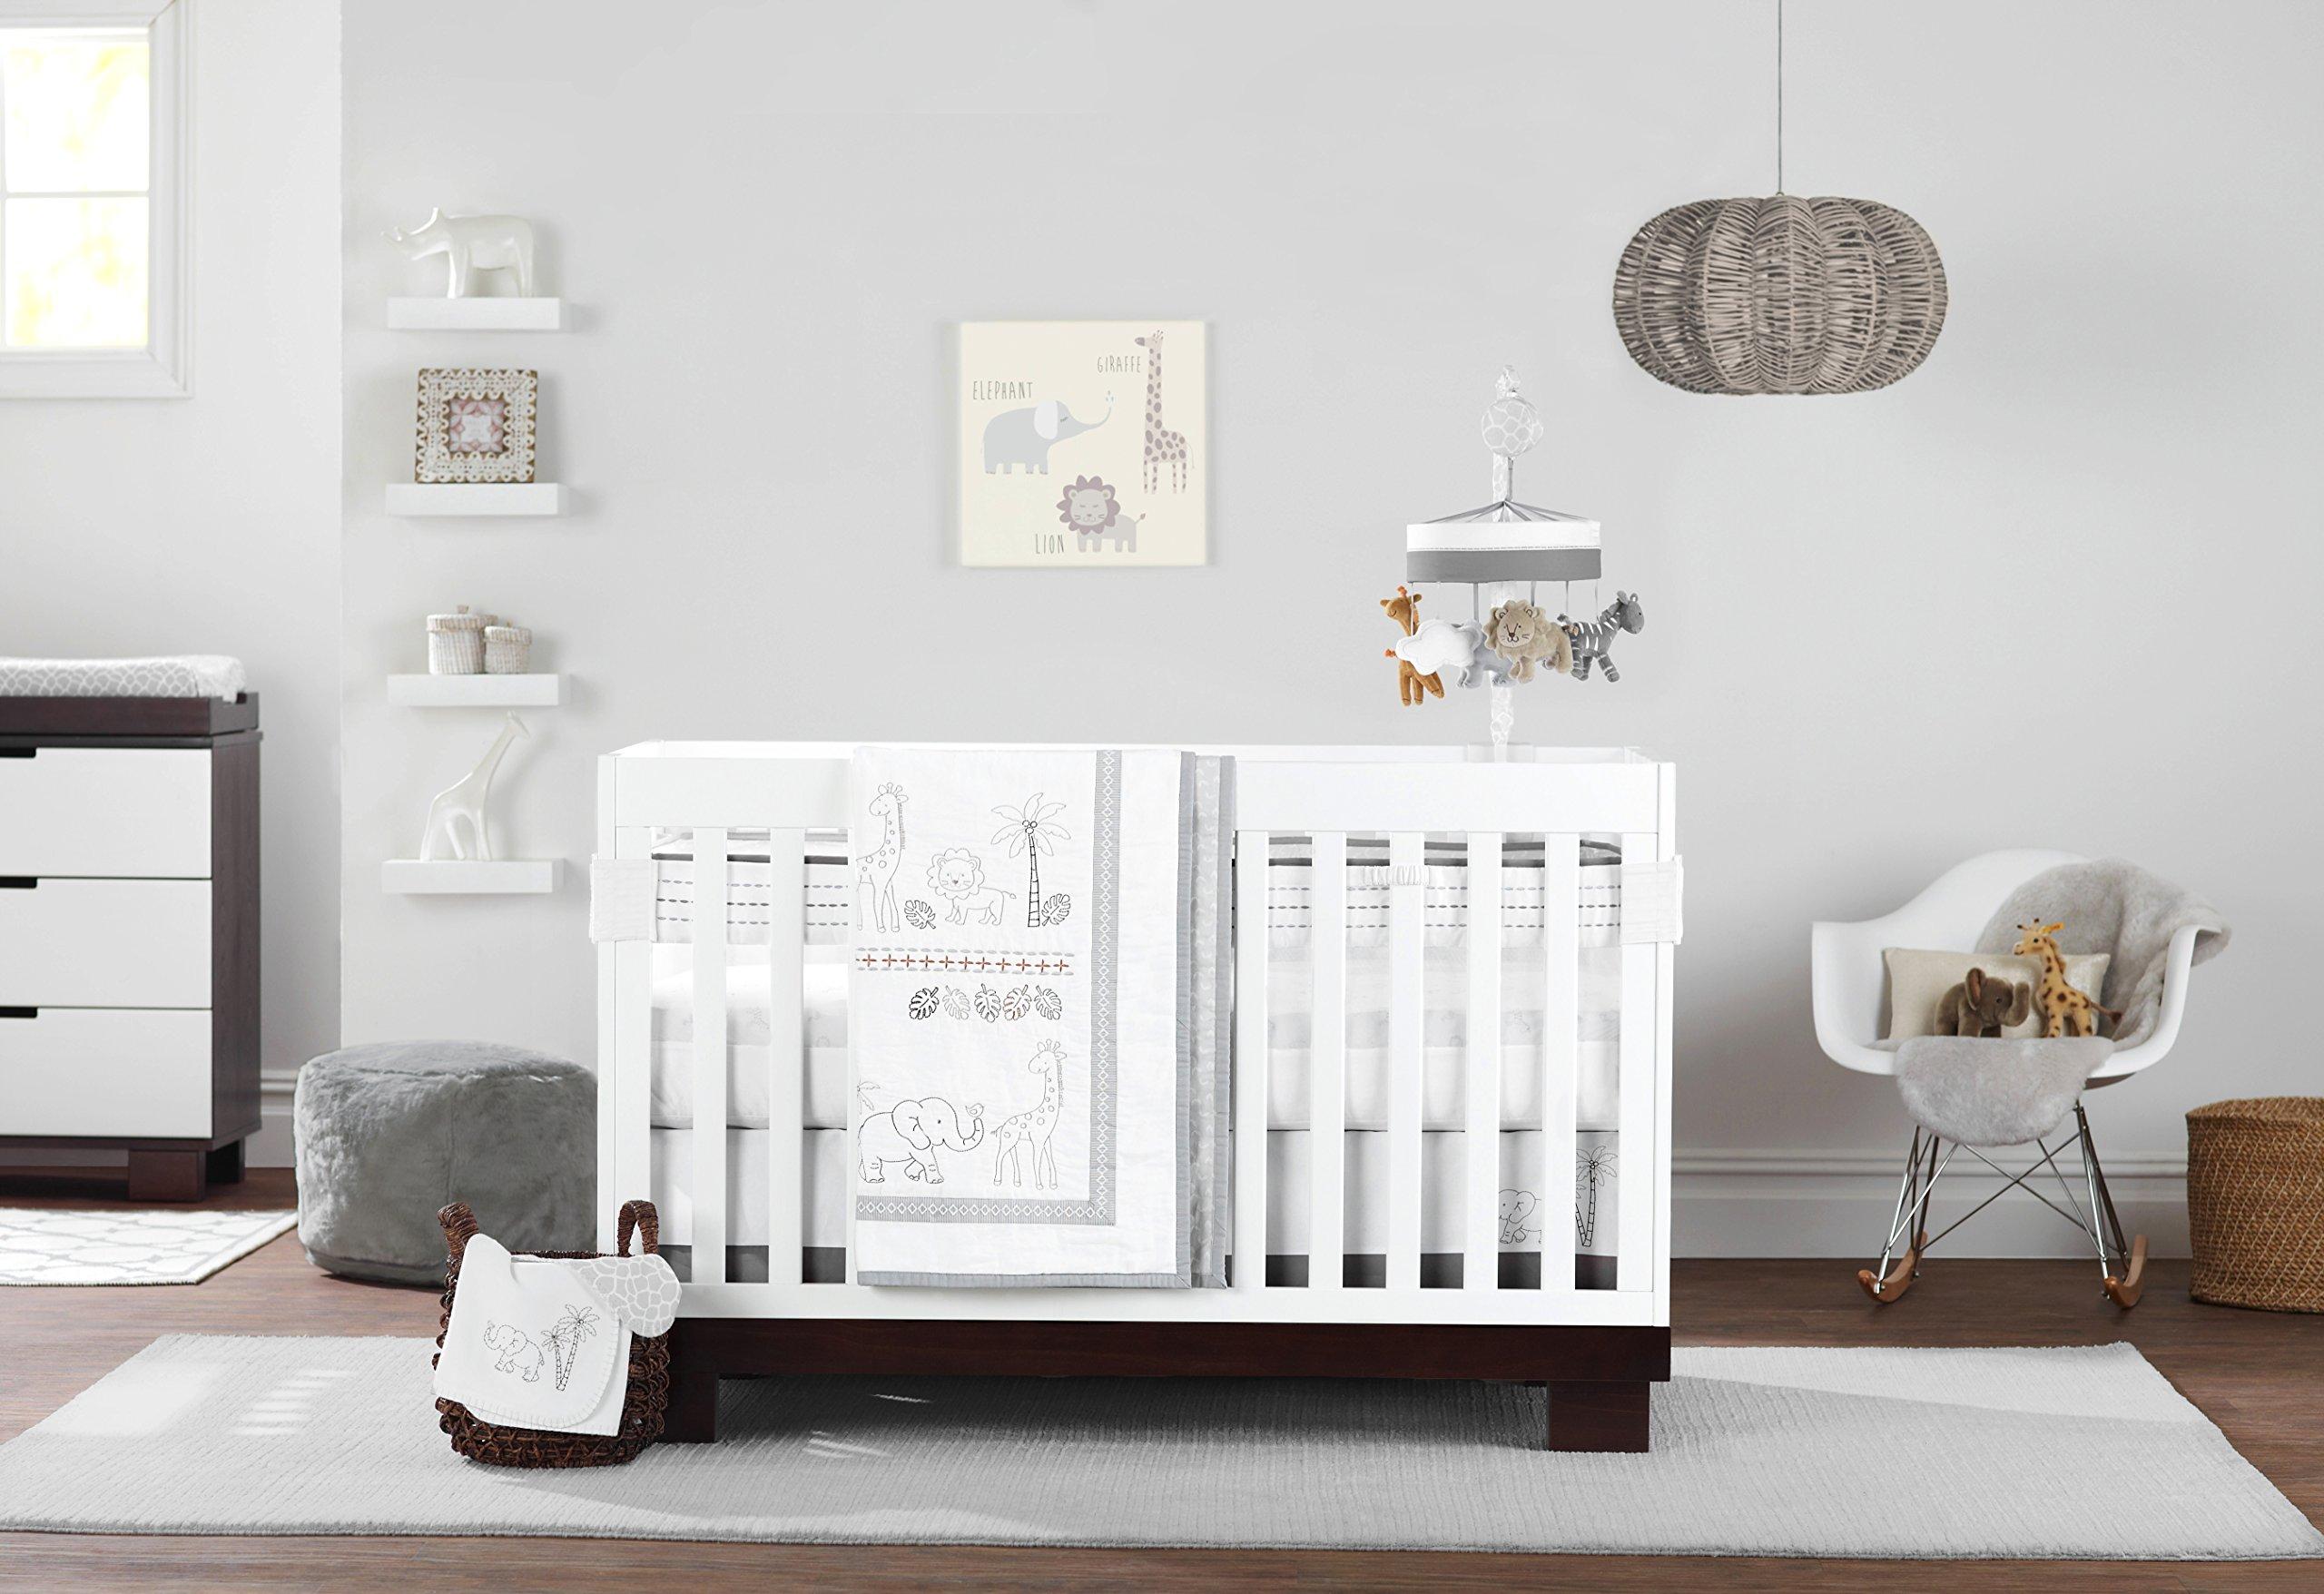 Just Born Animal Kingdom 3 Piece Crib Bedding Set, Safari/Jungle Neutral